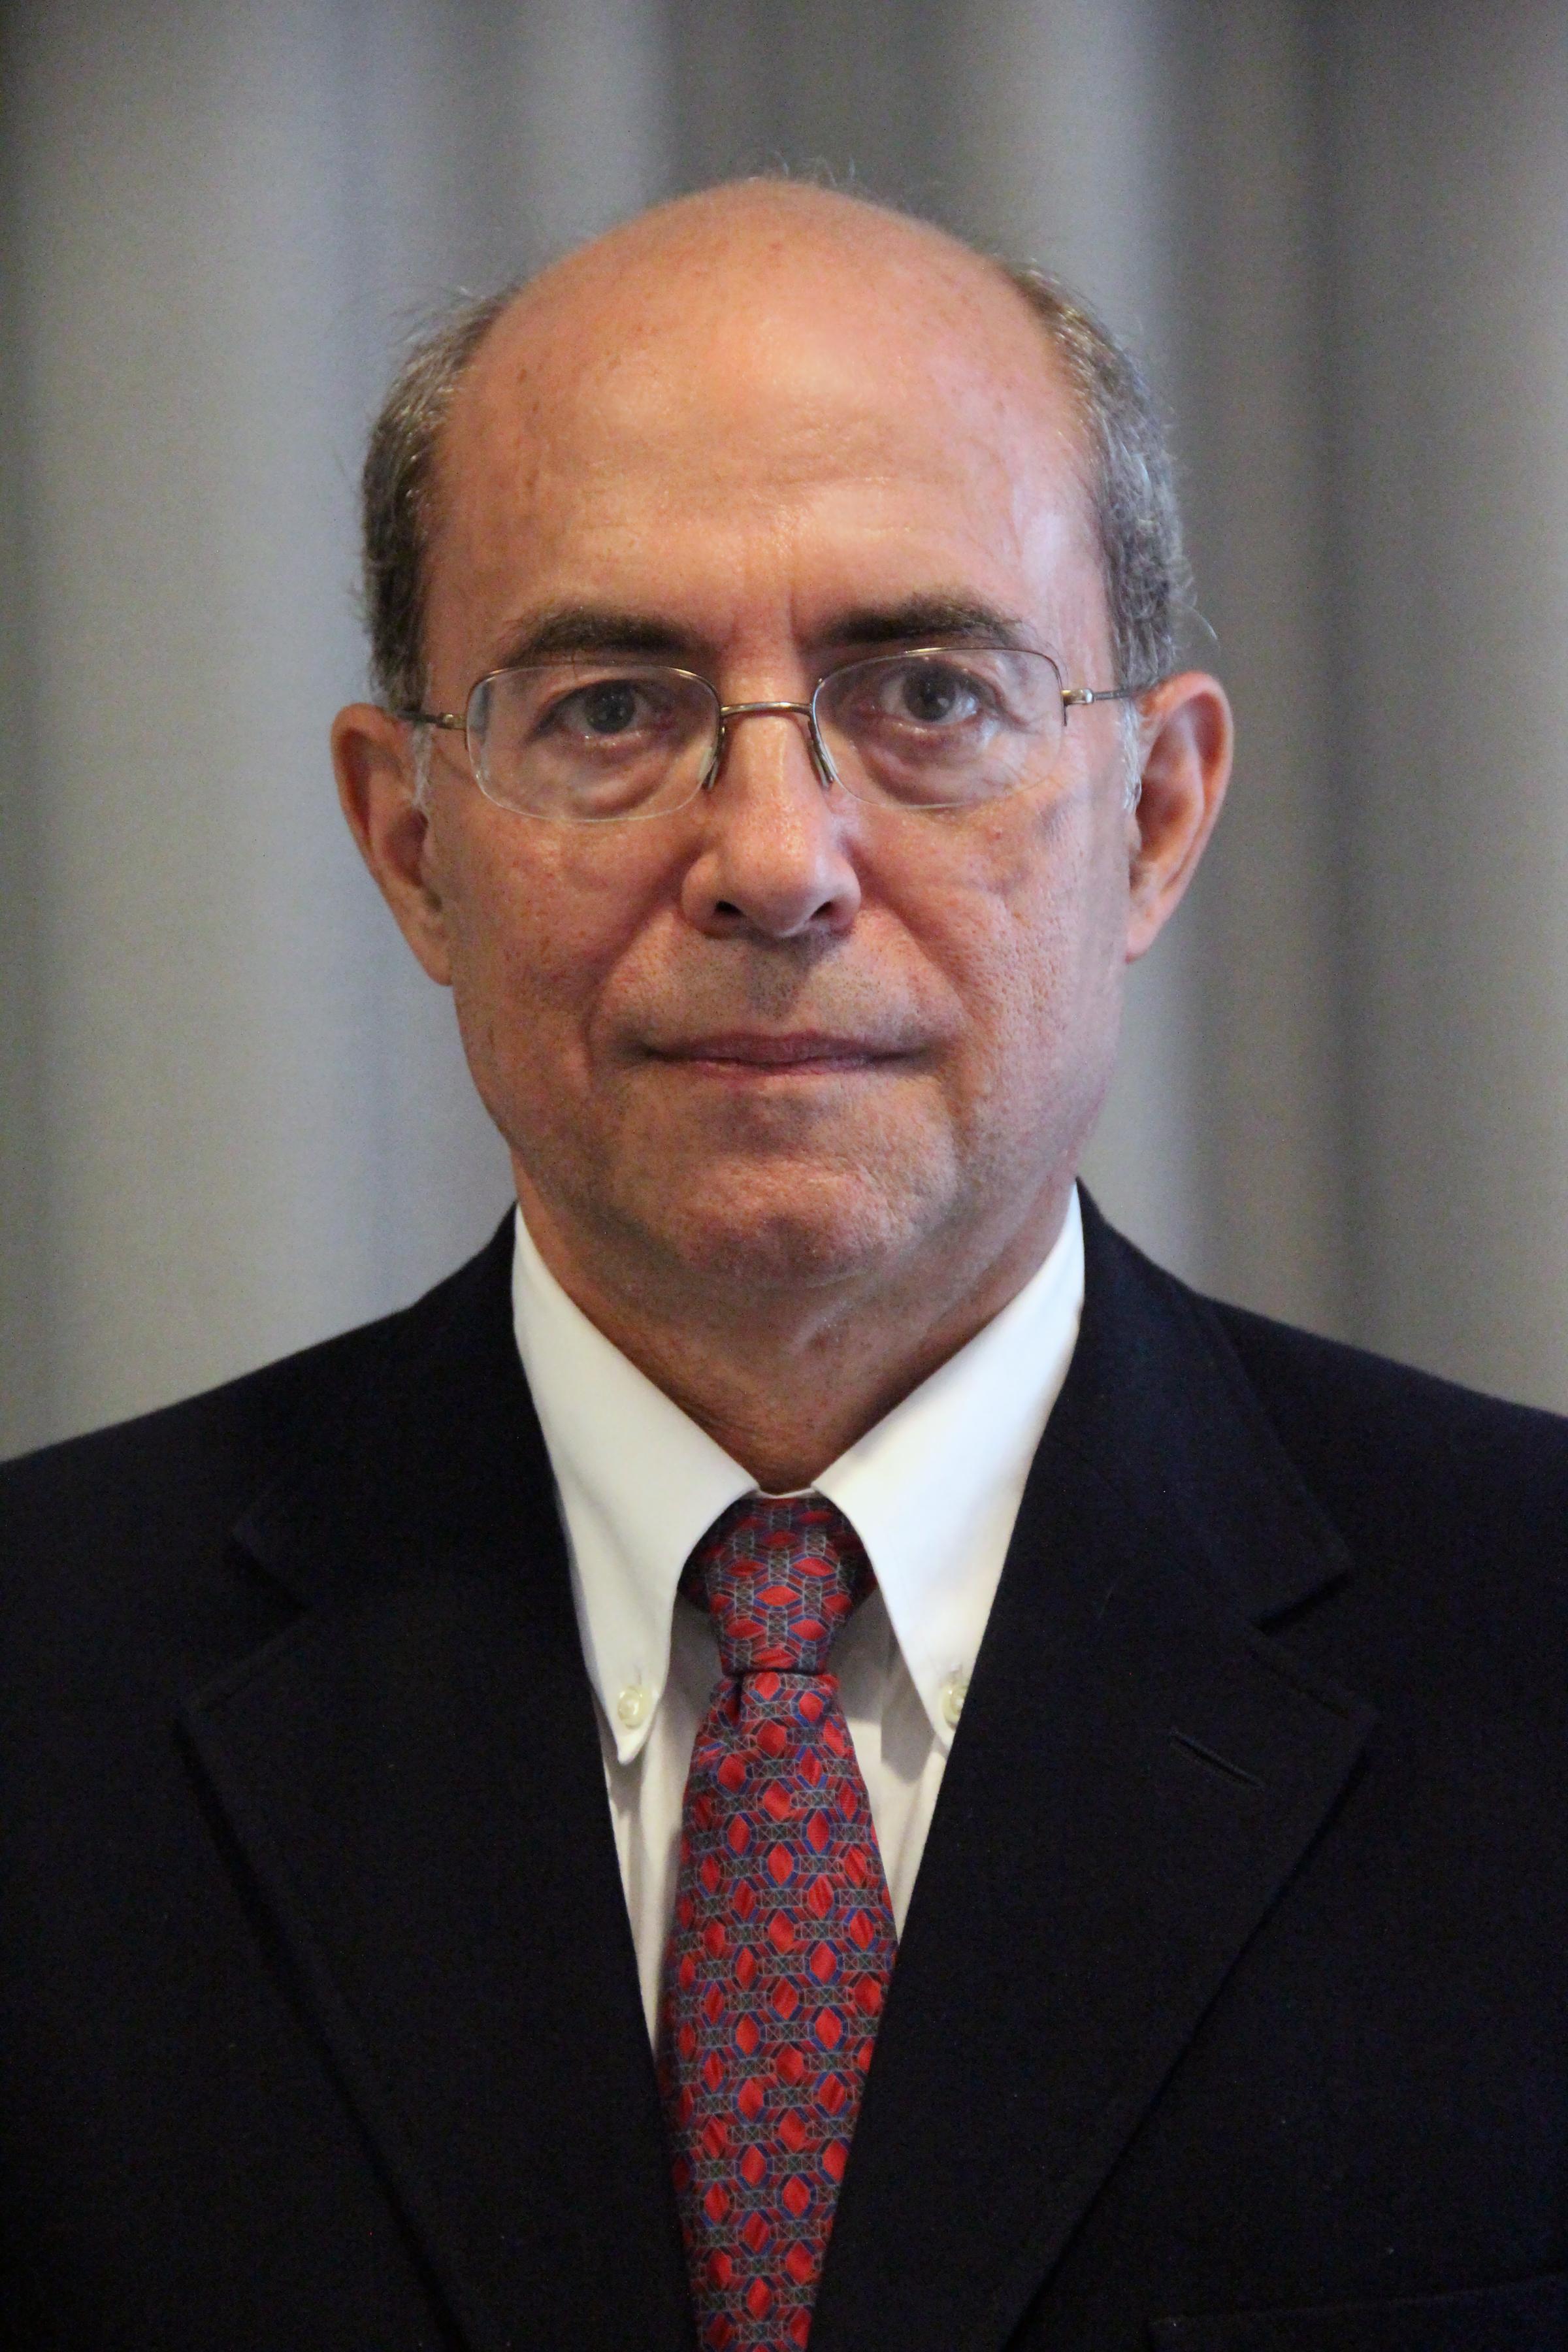 Dr. James F. Leckman